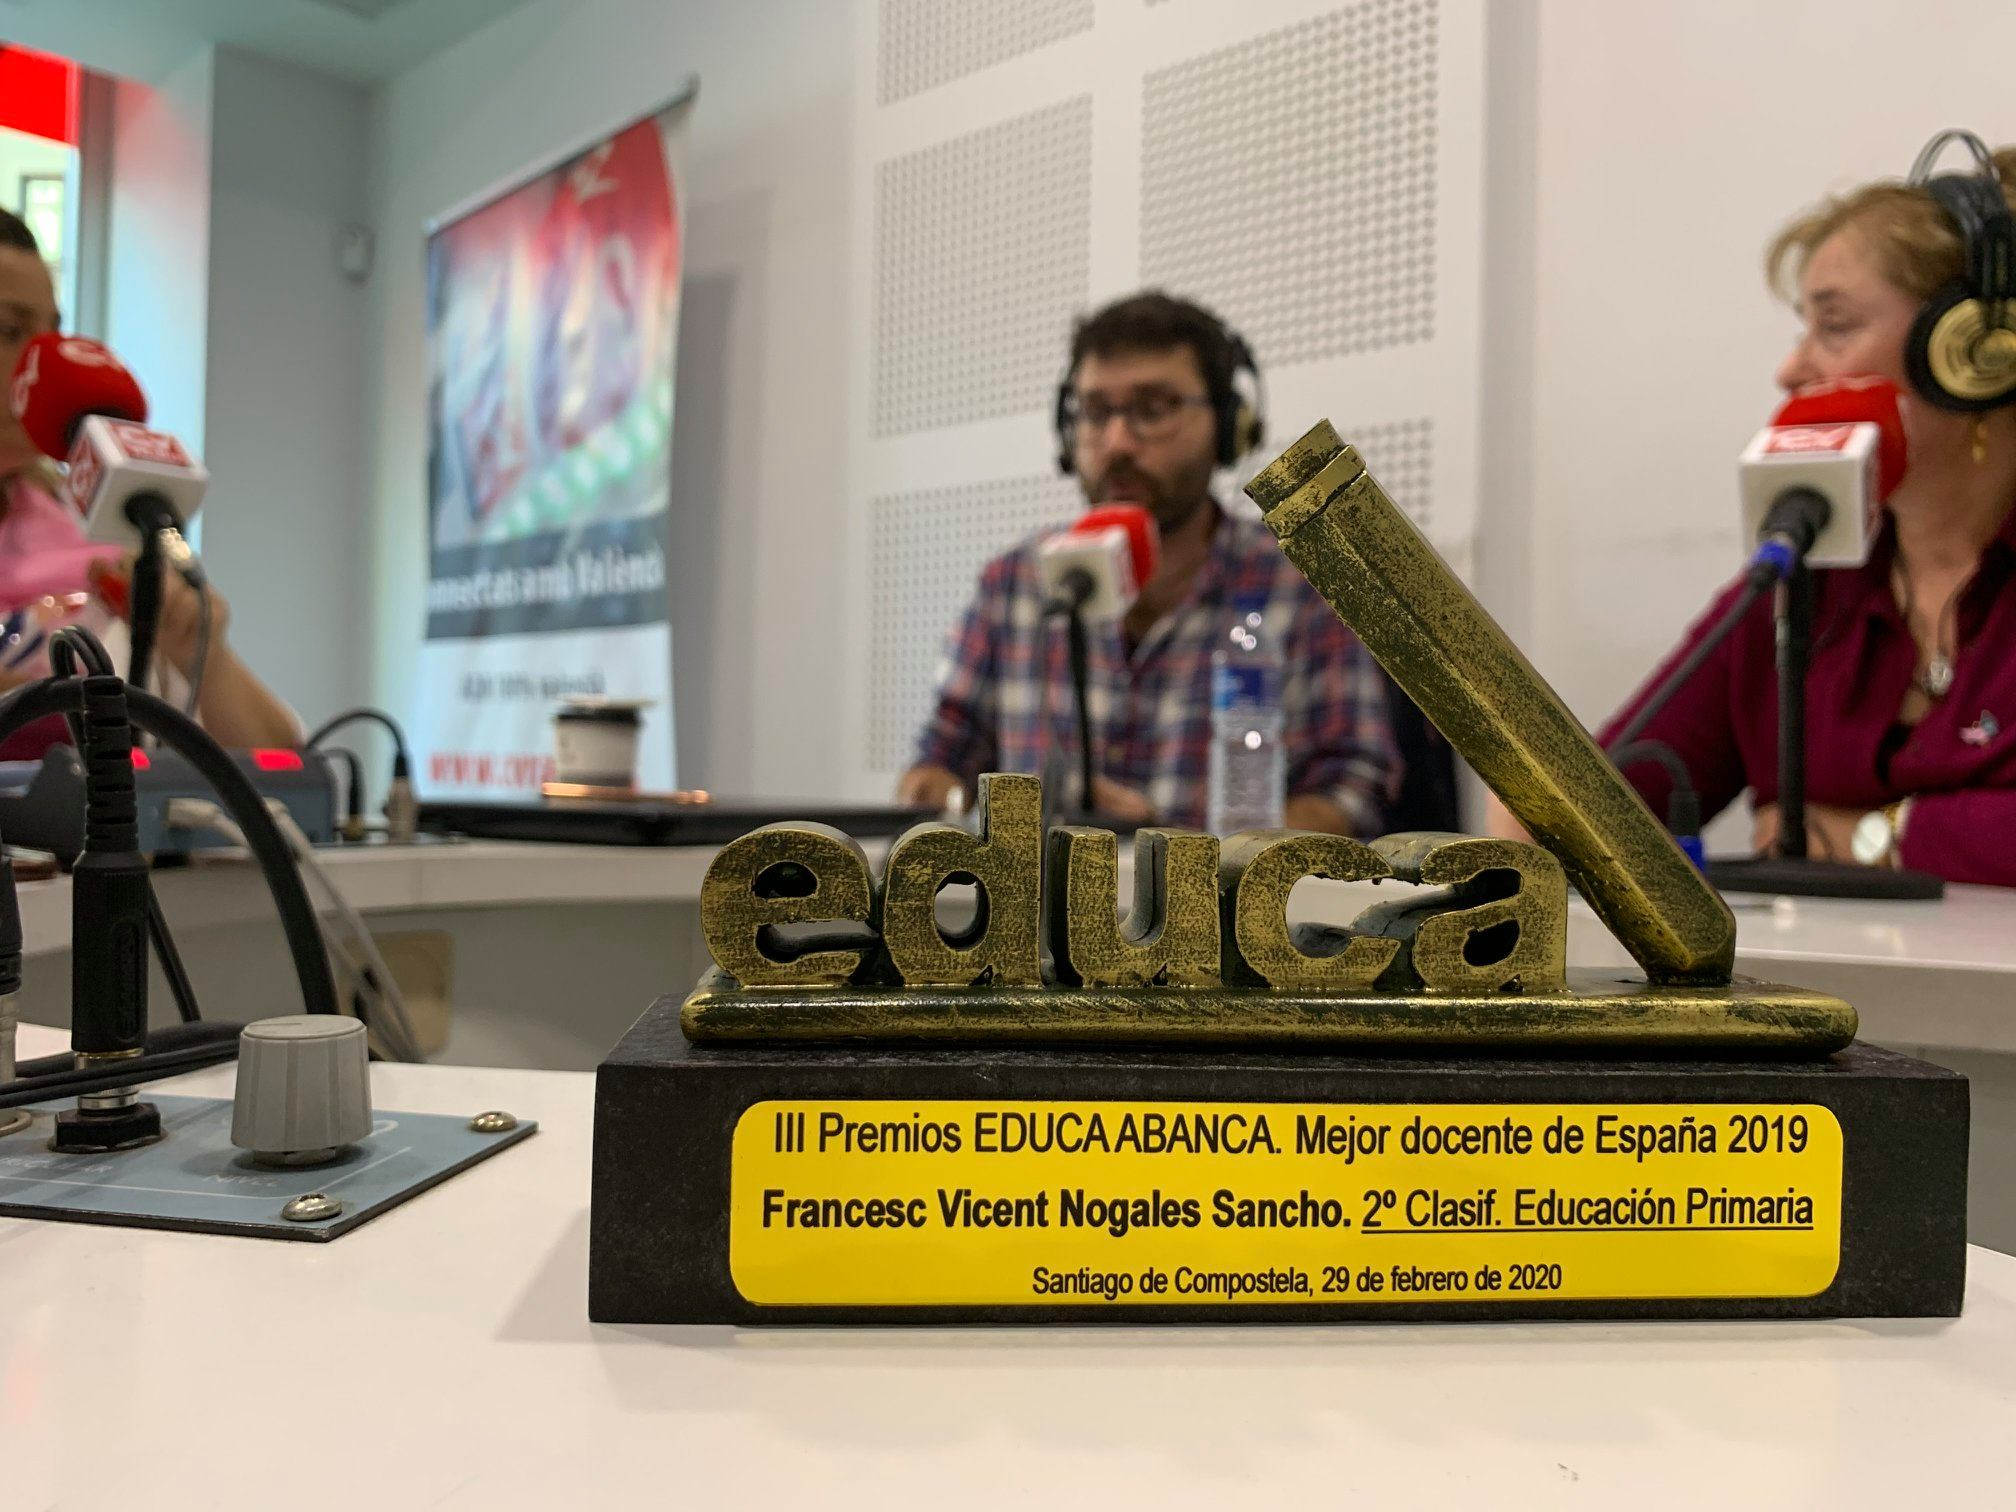 Francesc Nogales Sancho, mejor profesor España